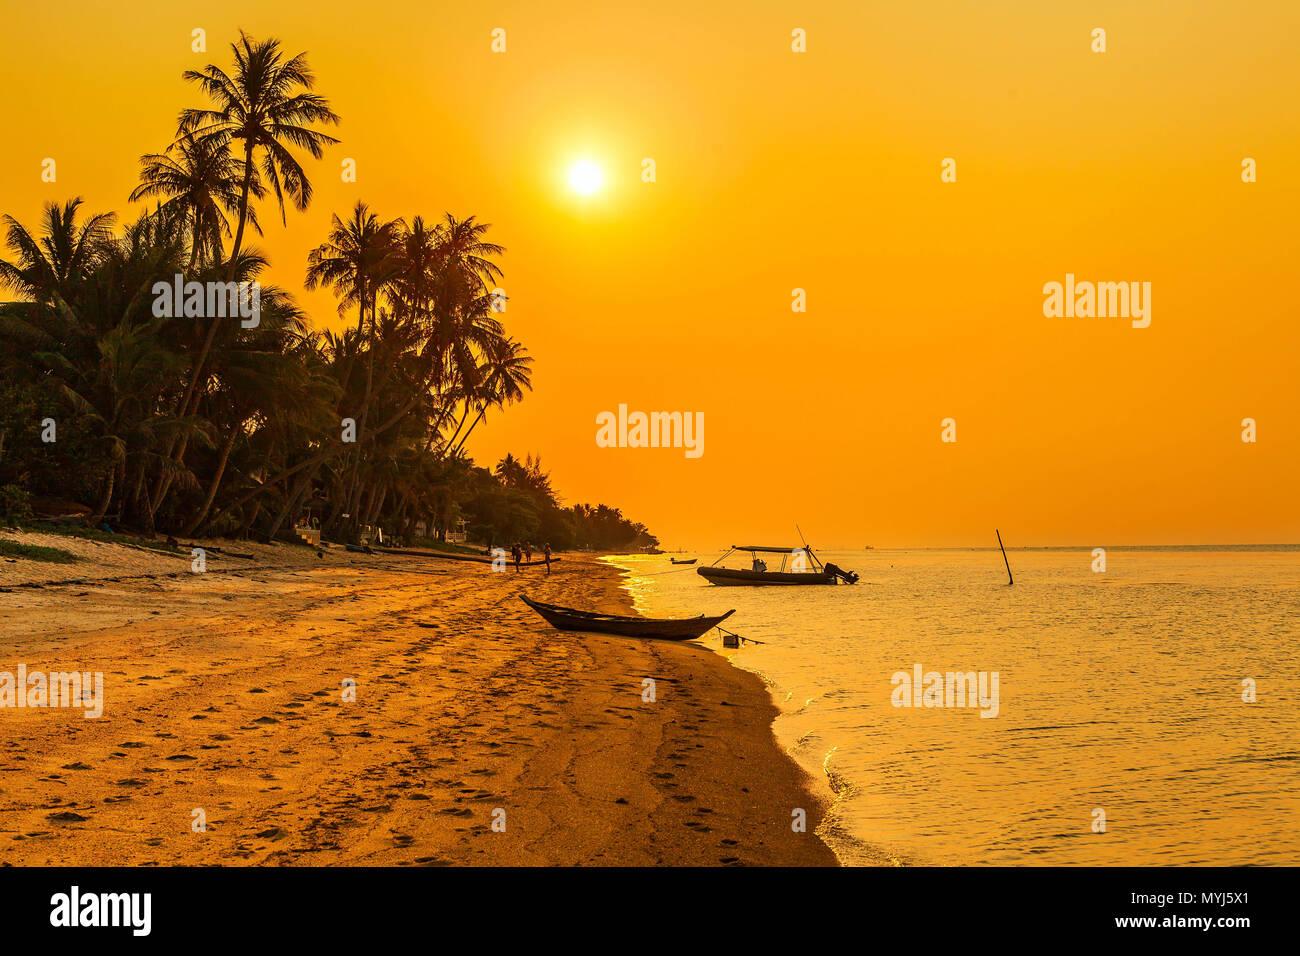 Sunset on the beach of Bang Po. Samui Island. Thailand. - Stock Image